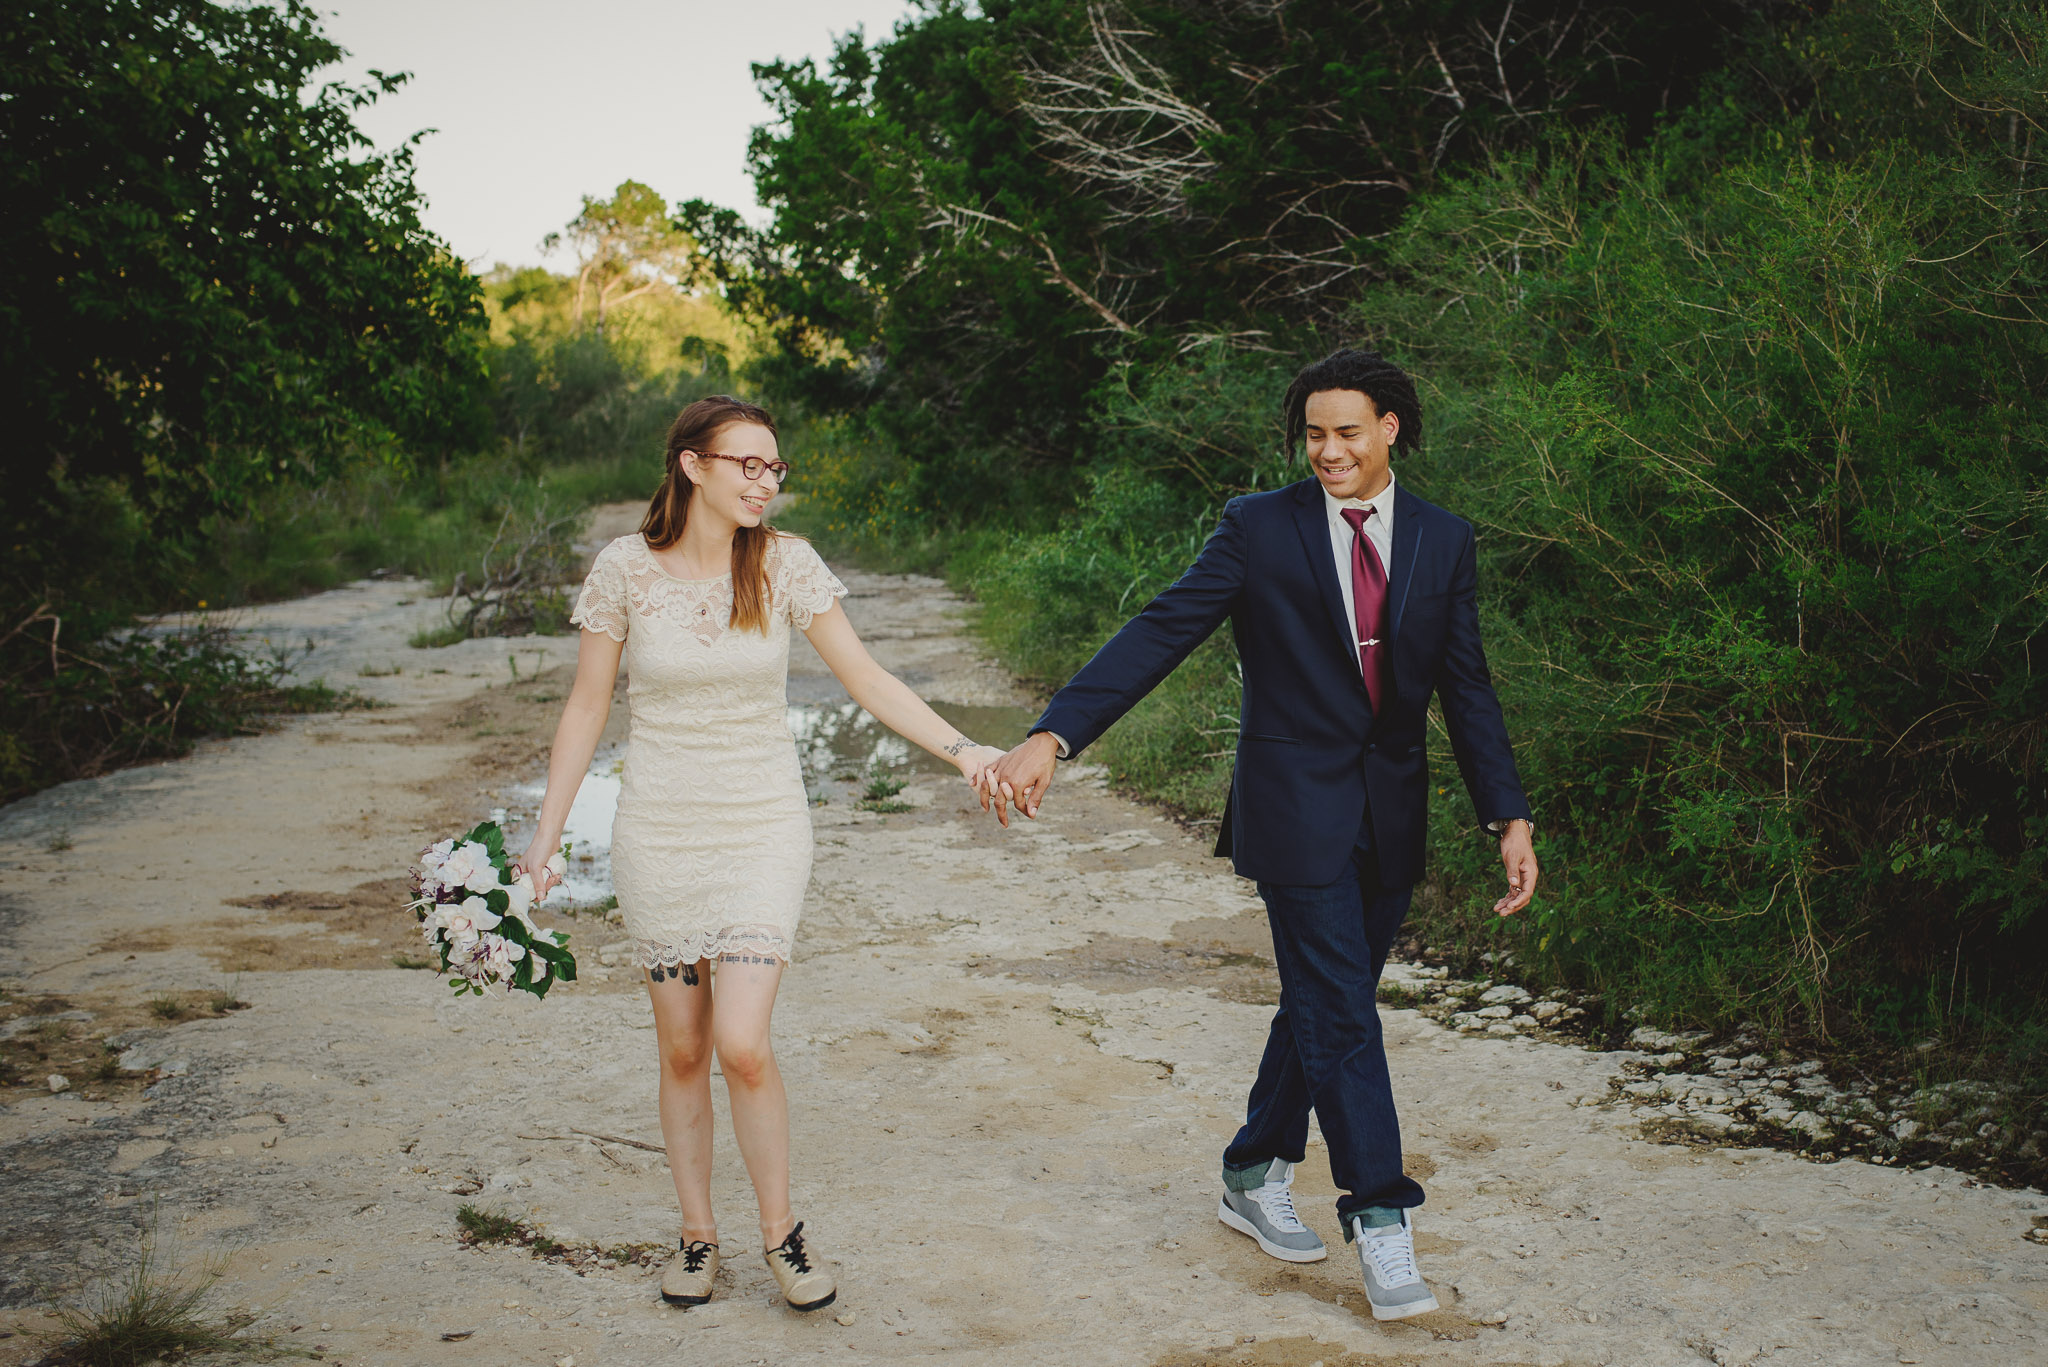 Austin-texas-wedding-photographer-McKinney-Falls-State-Park-0006.jpg